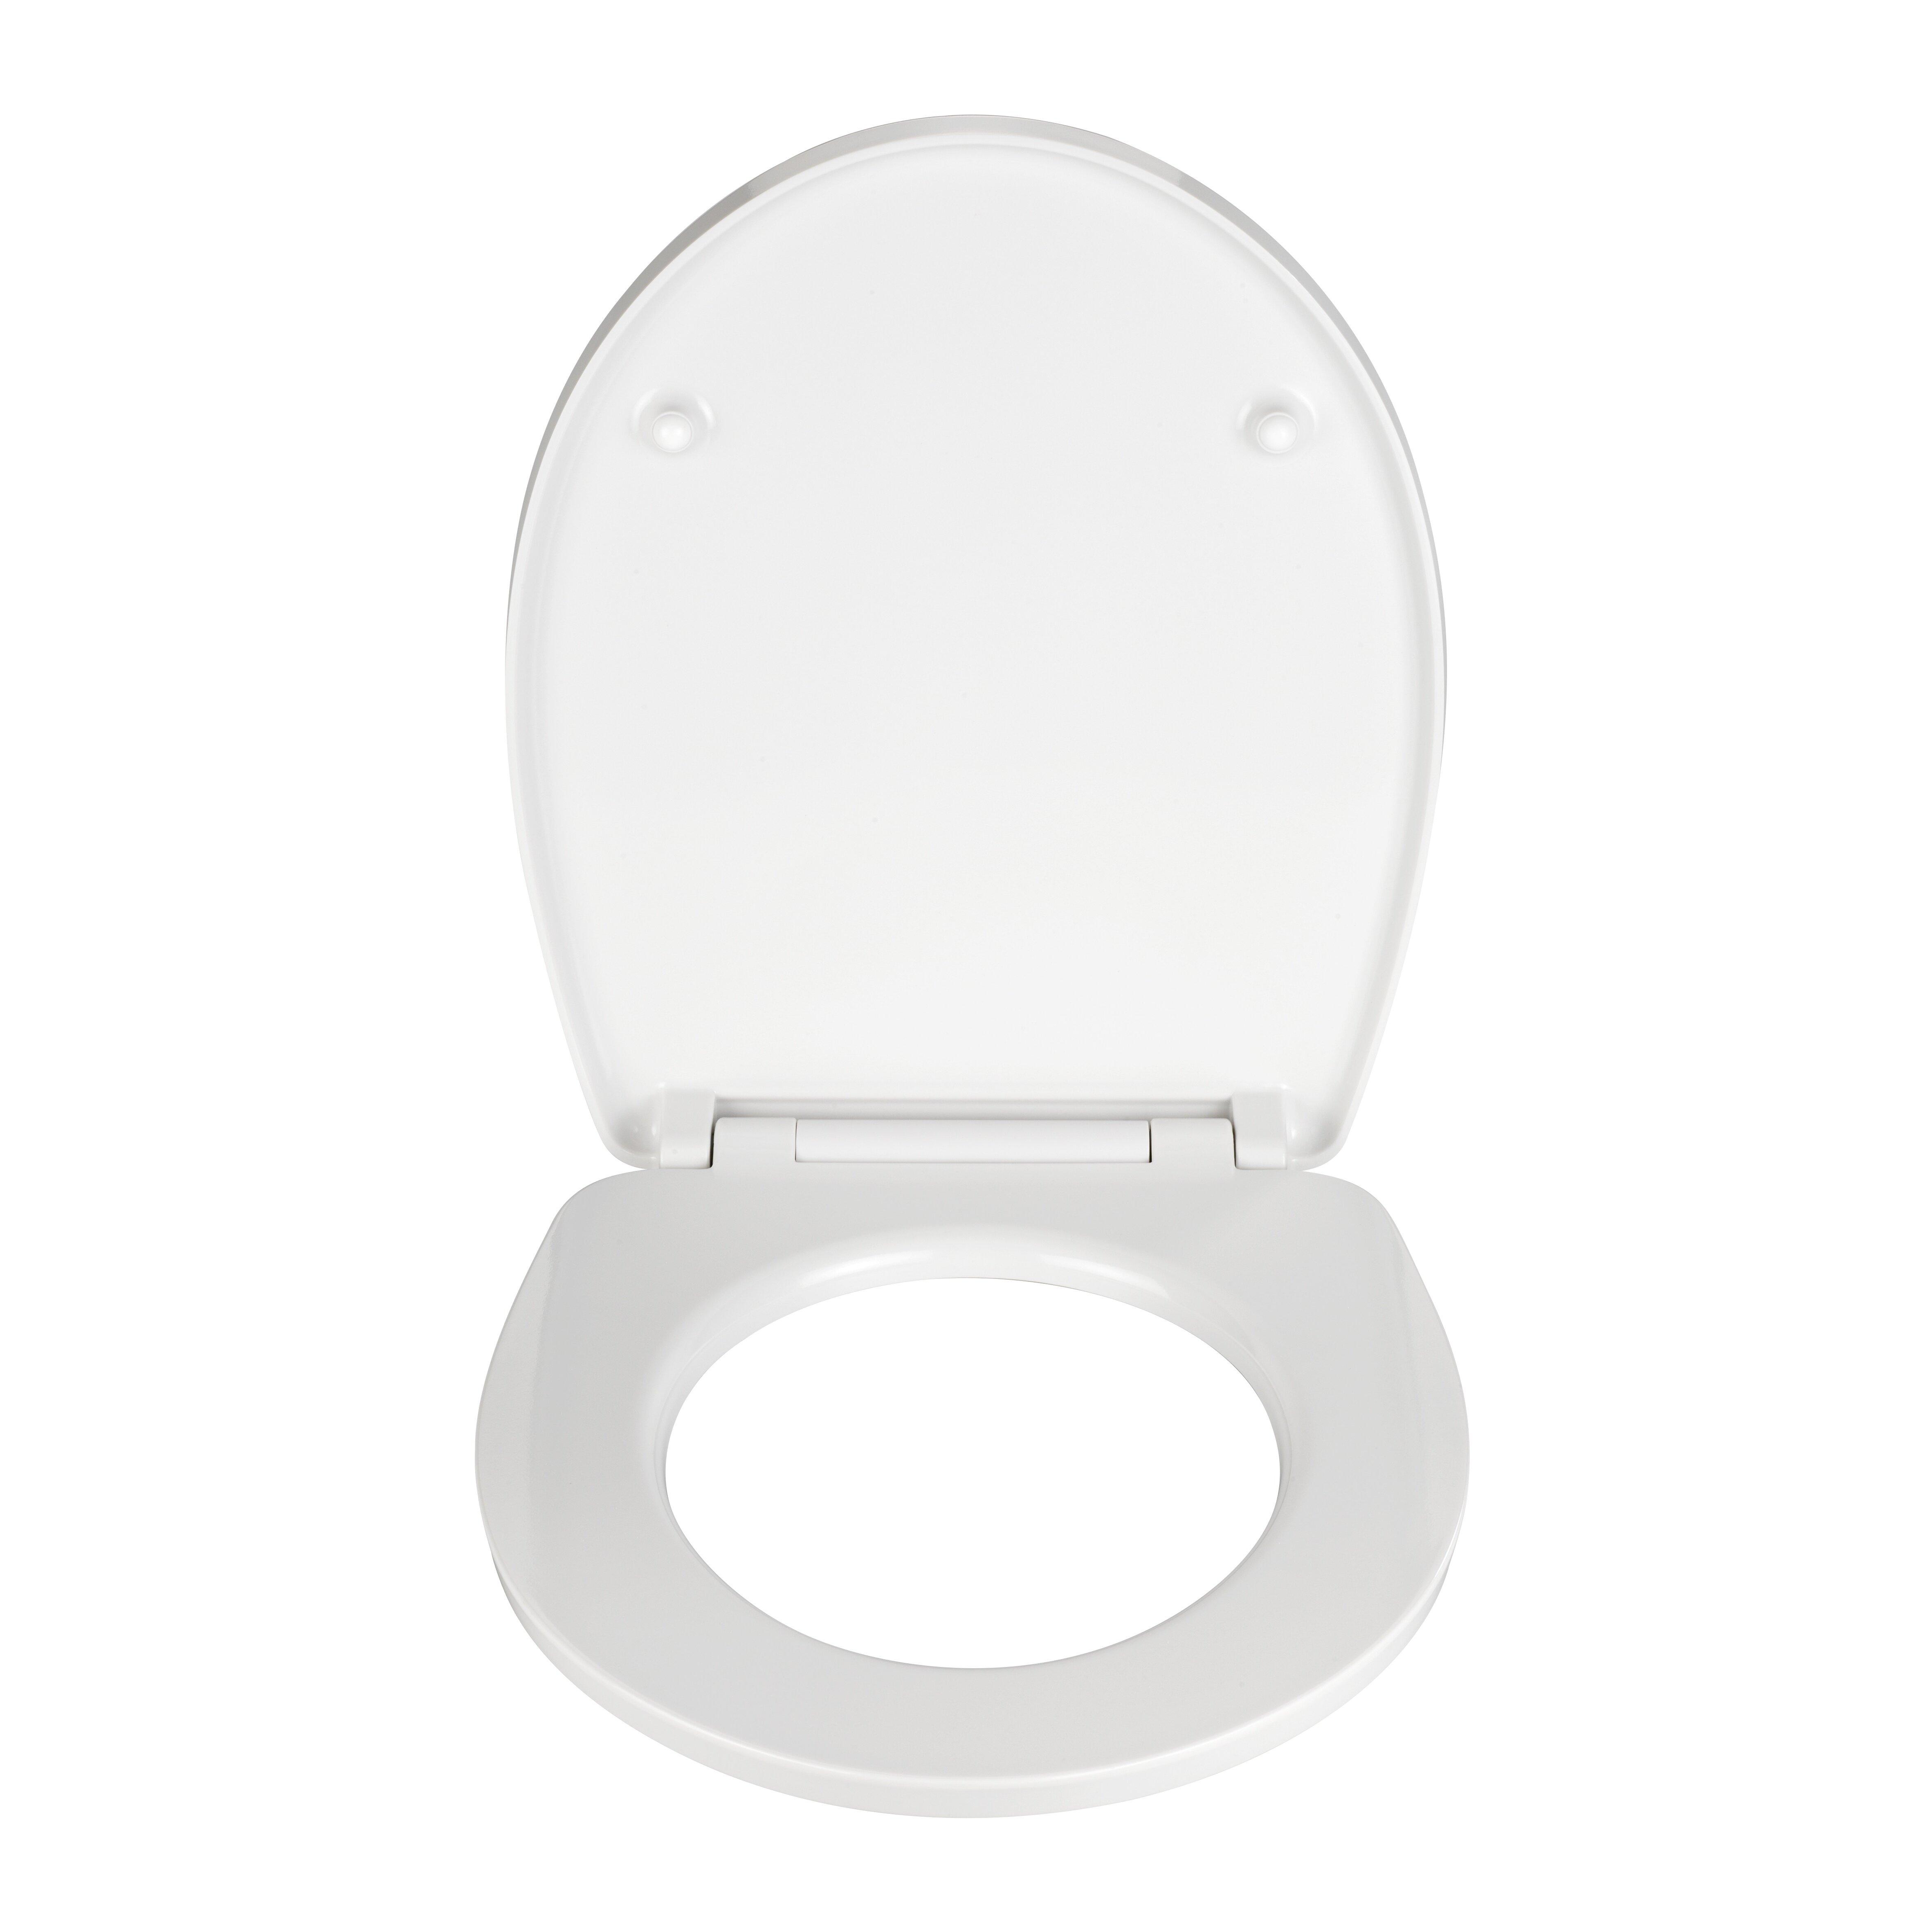 circular toilet seat uk. HARD WOOD STANDARD ROUND TOILET SEAT  Shop Mayfair Lift Off Cushioned Vinyl Round Toilet Seat At Soft